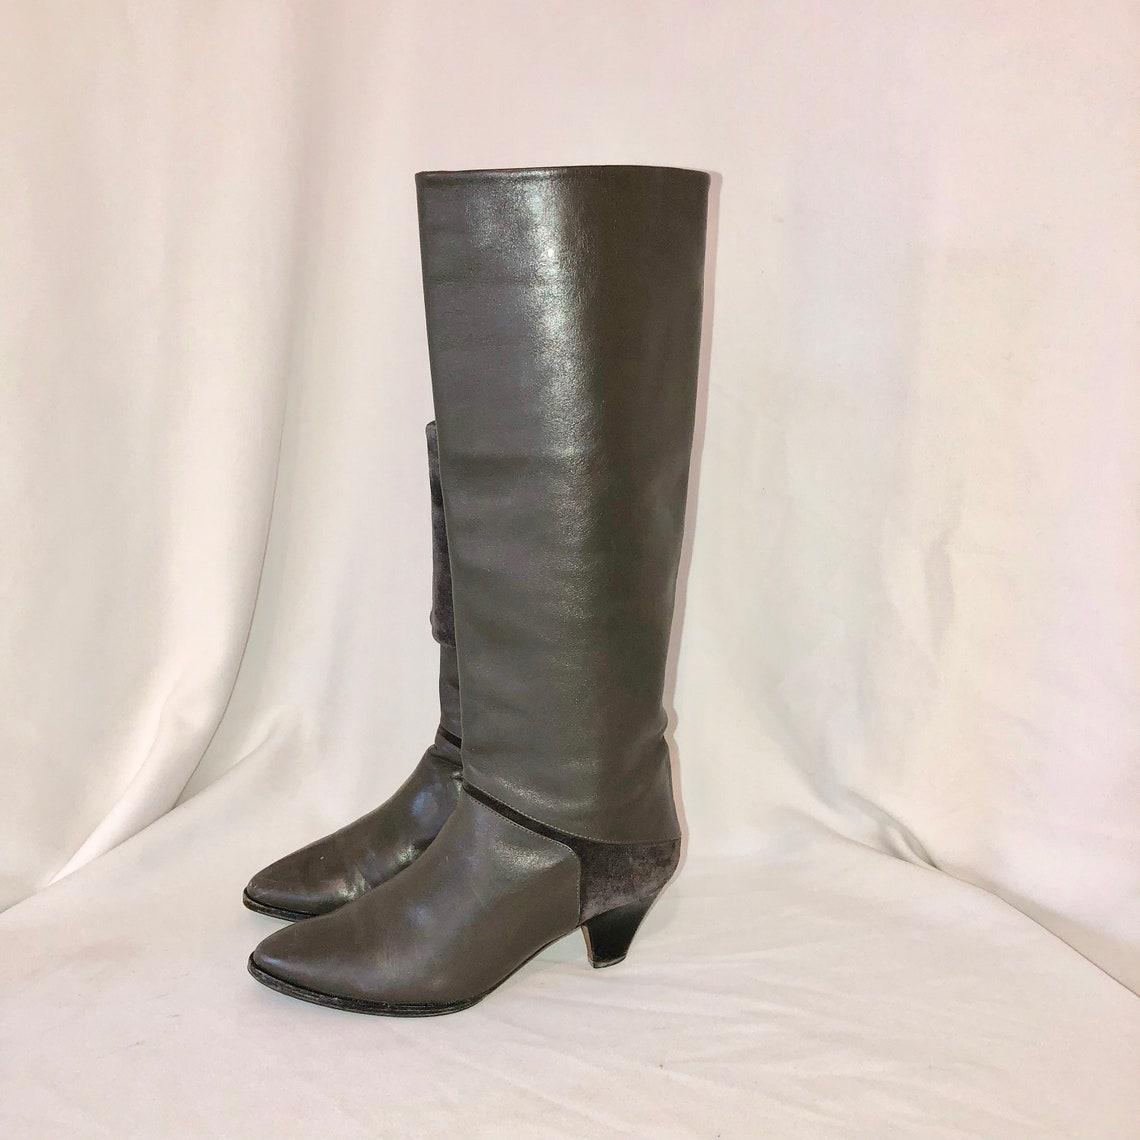 Sz 6 B Vintage Tall Gray Genuine Leather & Suede 1980s Women - Big Sale atXcc